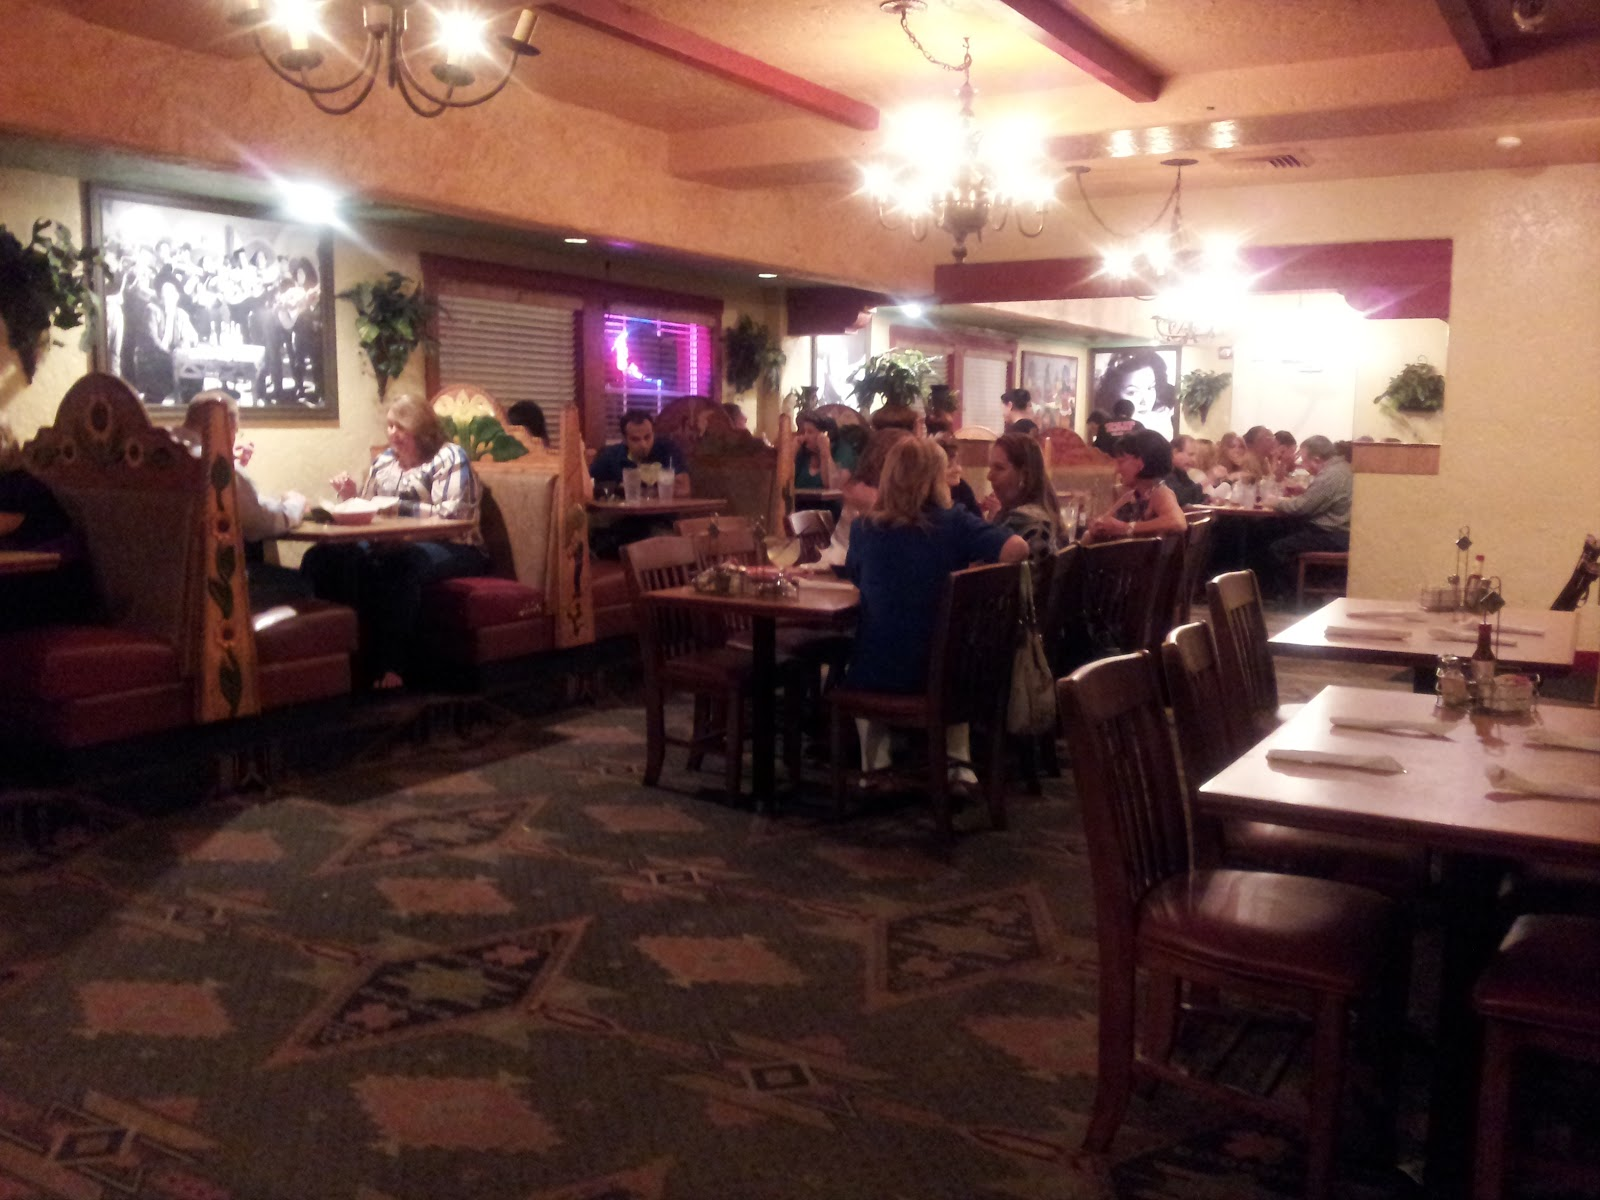 Dining Floor of Azteca Real in Davie, FL